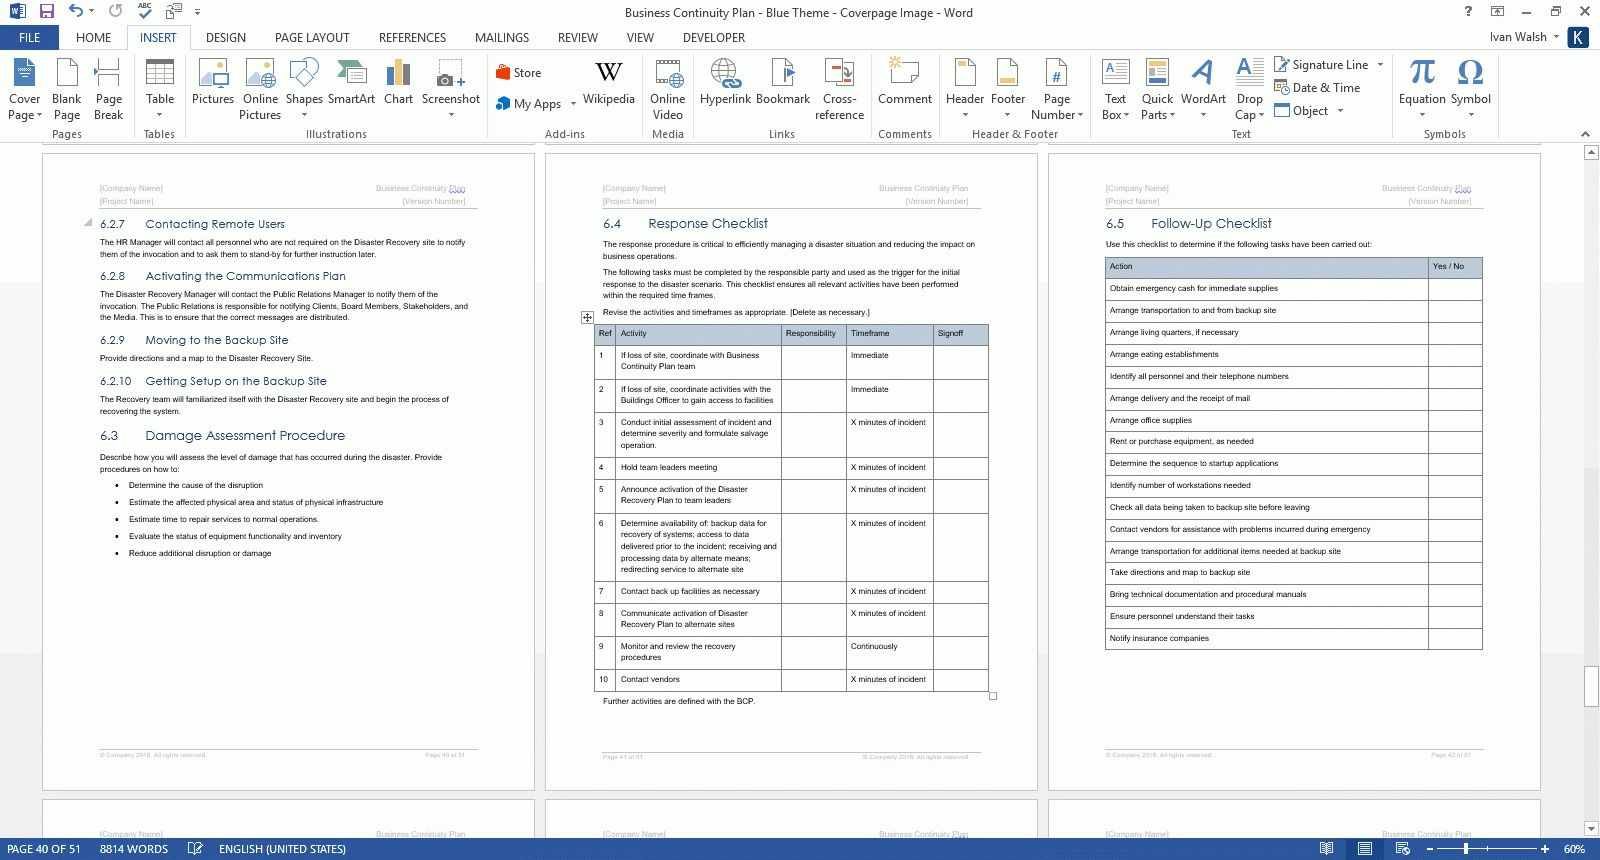 Business Continuity Plan Incident Checklist Excel Audit